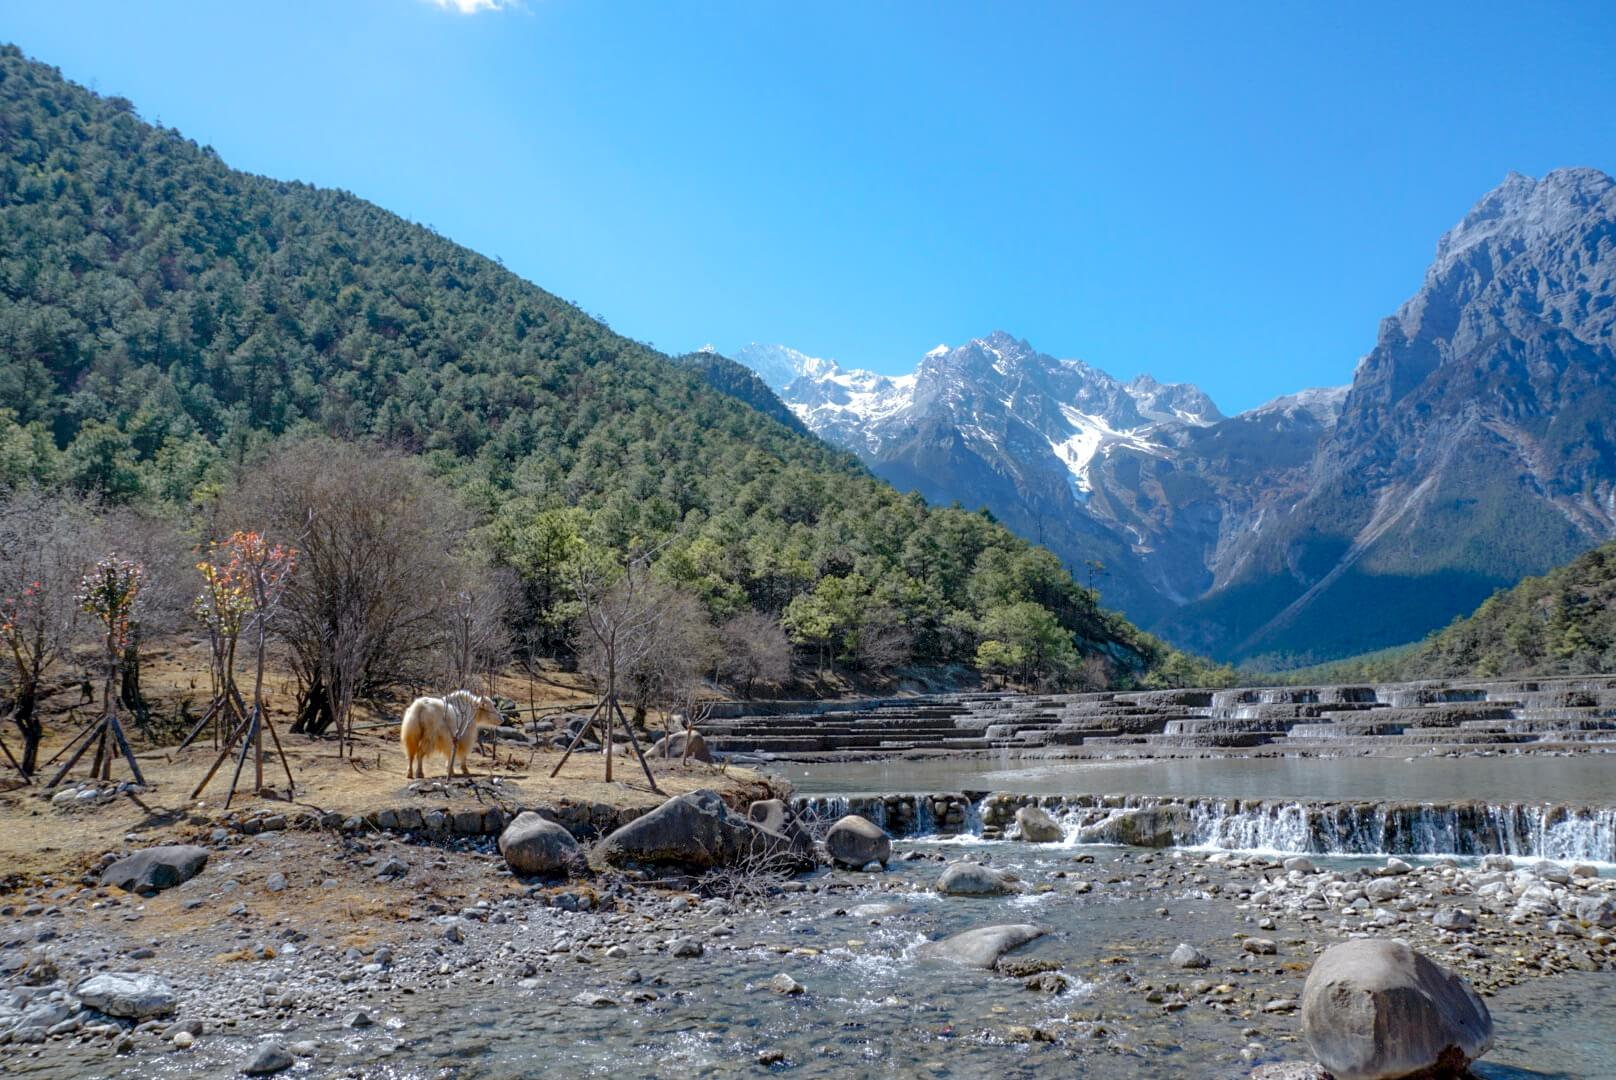 comment visiter la blue moon valley Lijiang chine blog